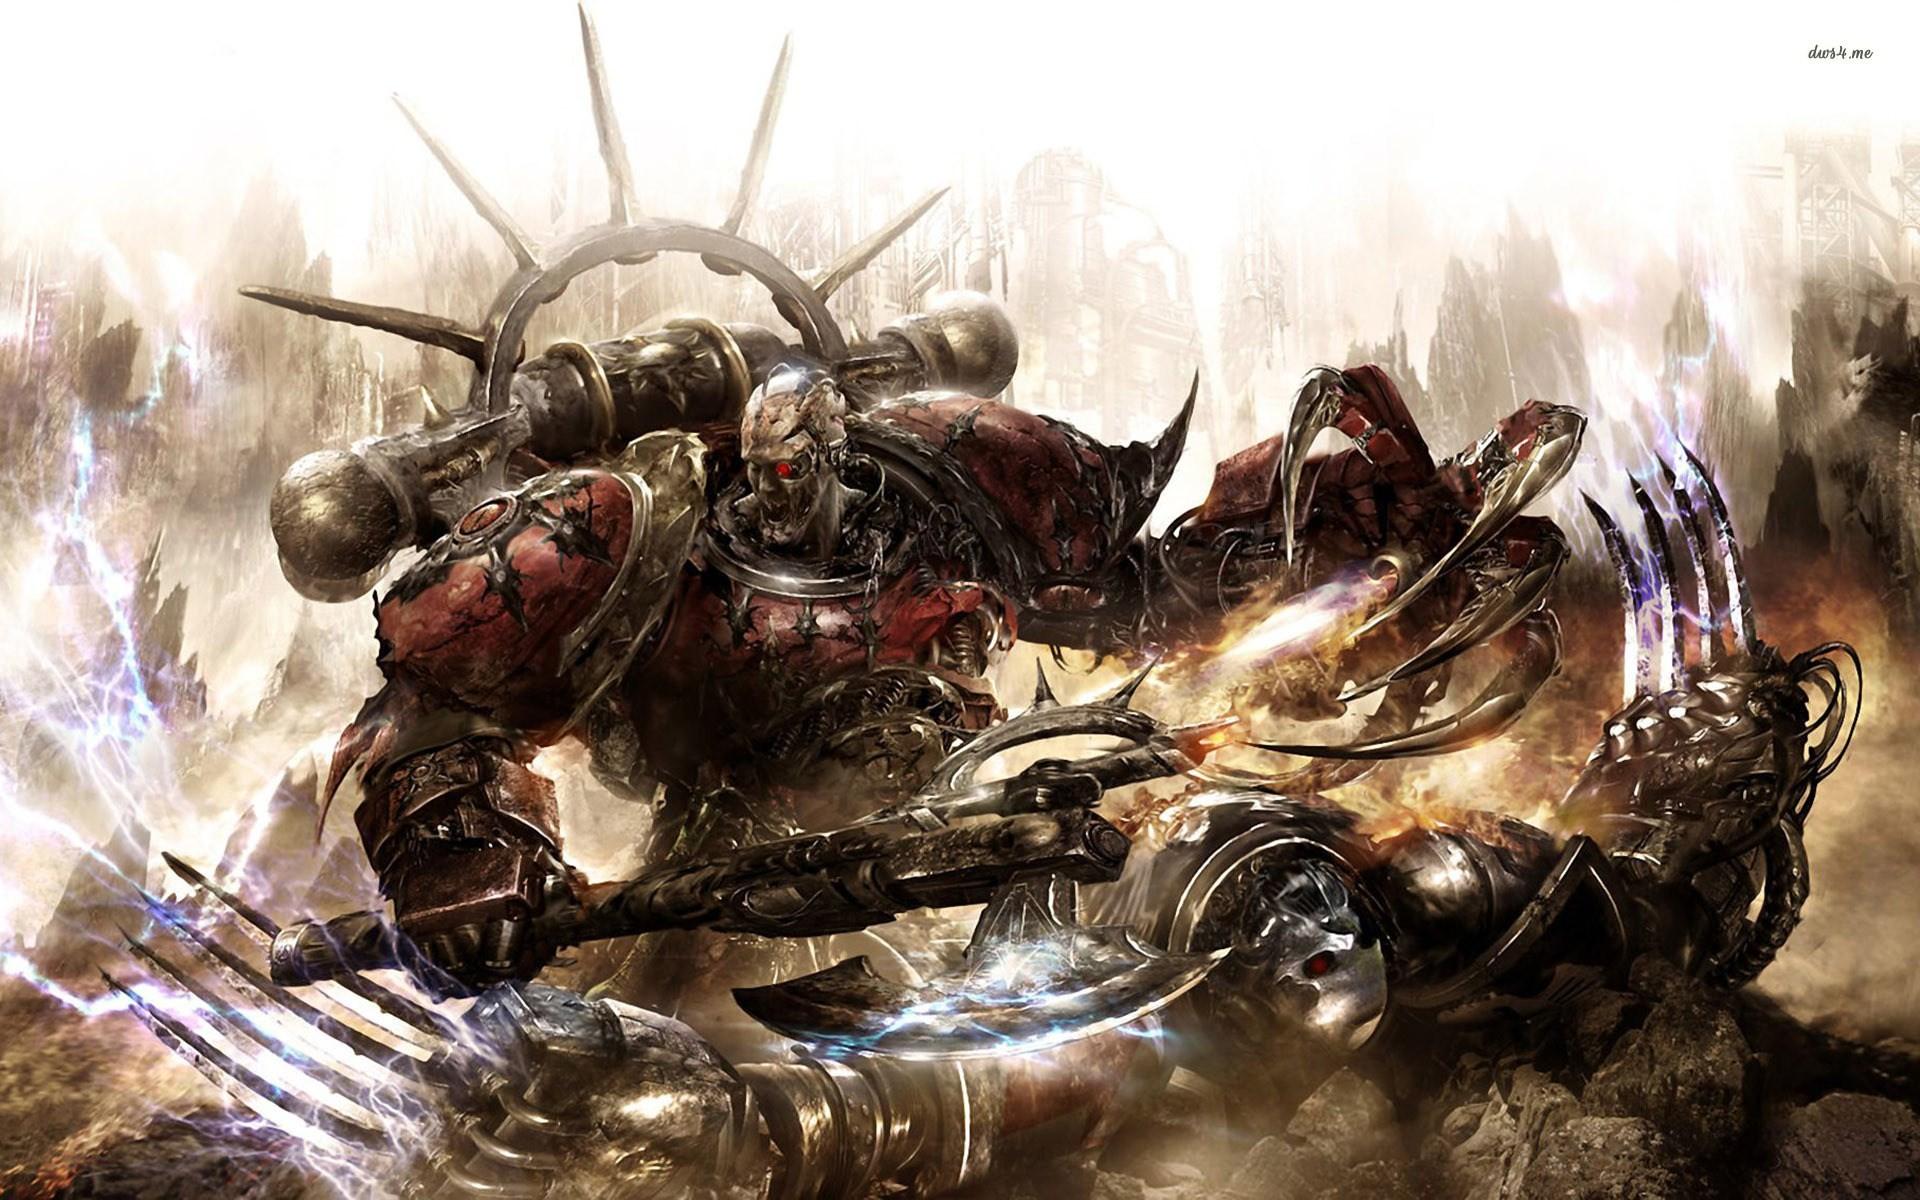 Warhammer 40k Chaos Wallpaper Wallpapersafari